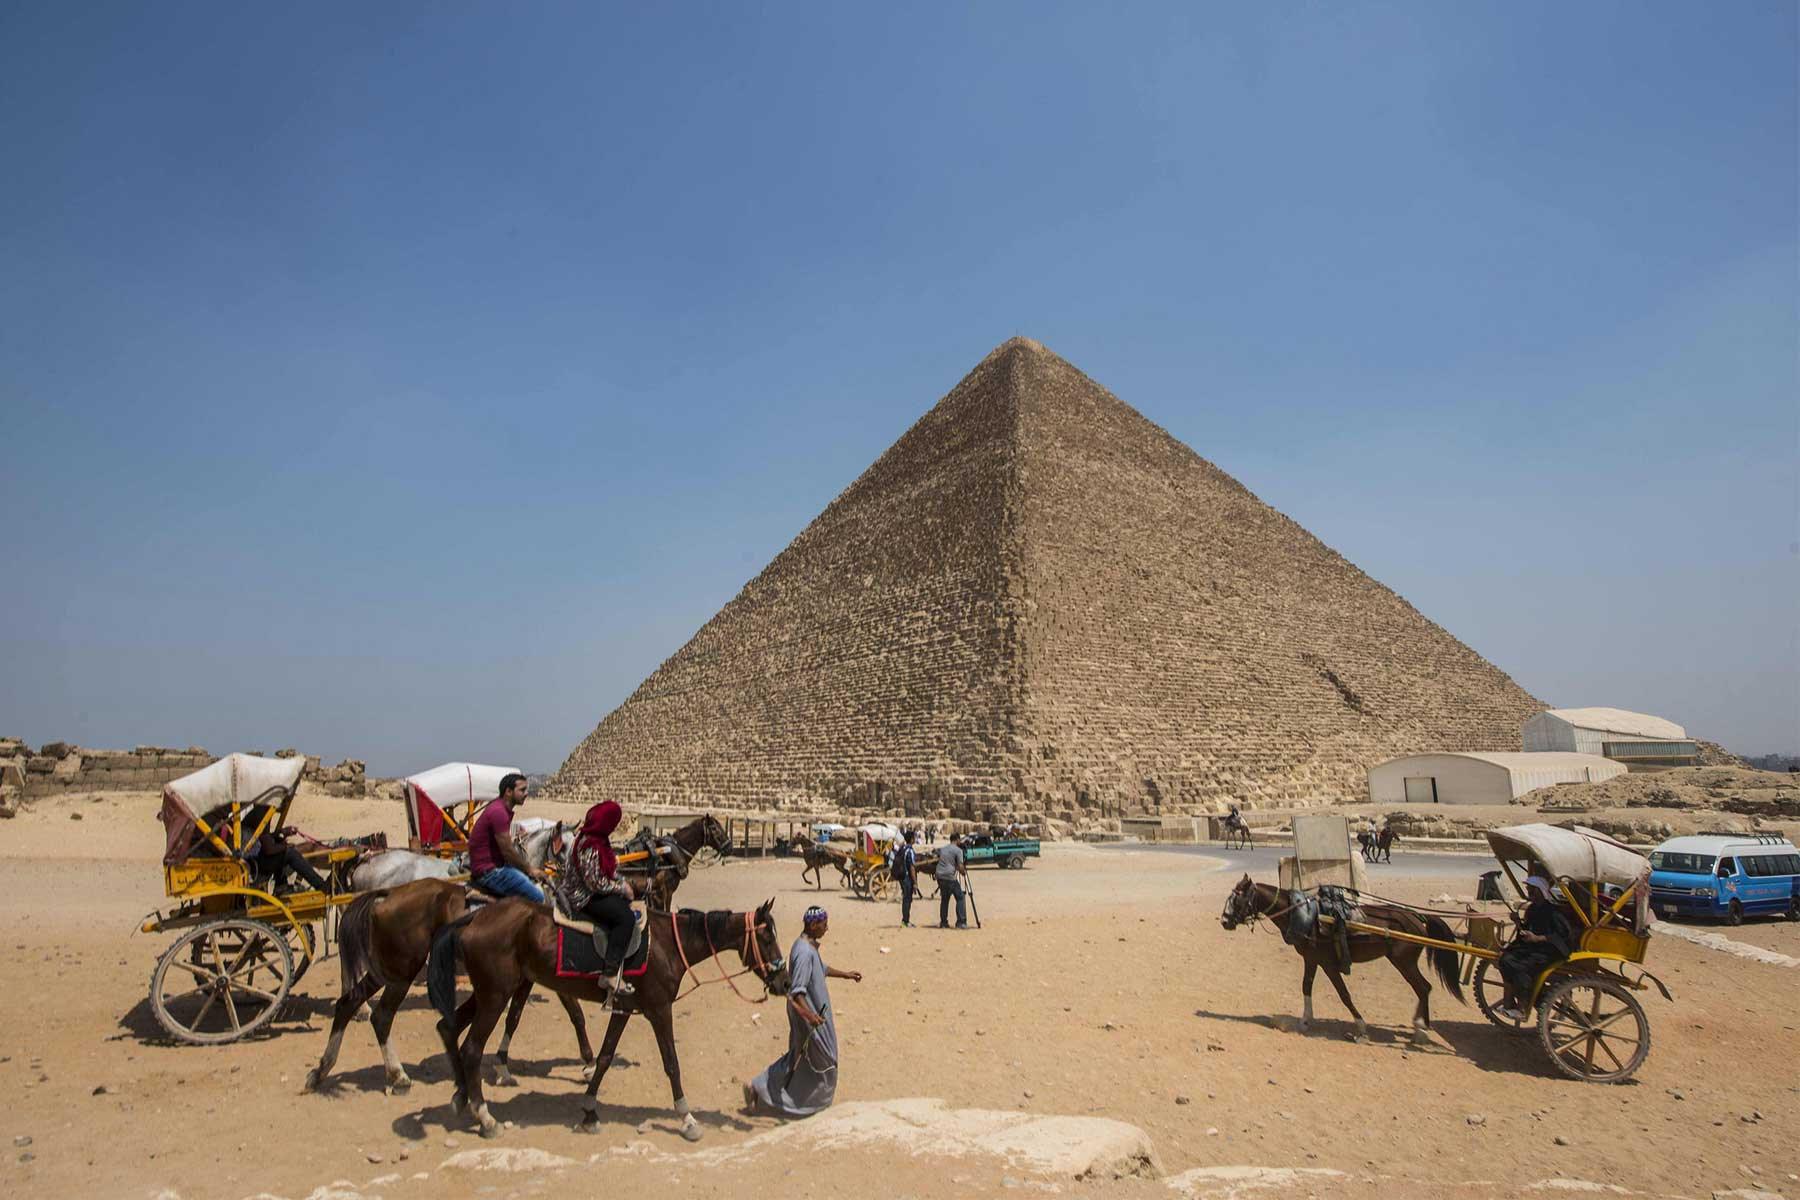 Pyramid complex at Giza